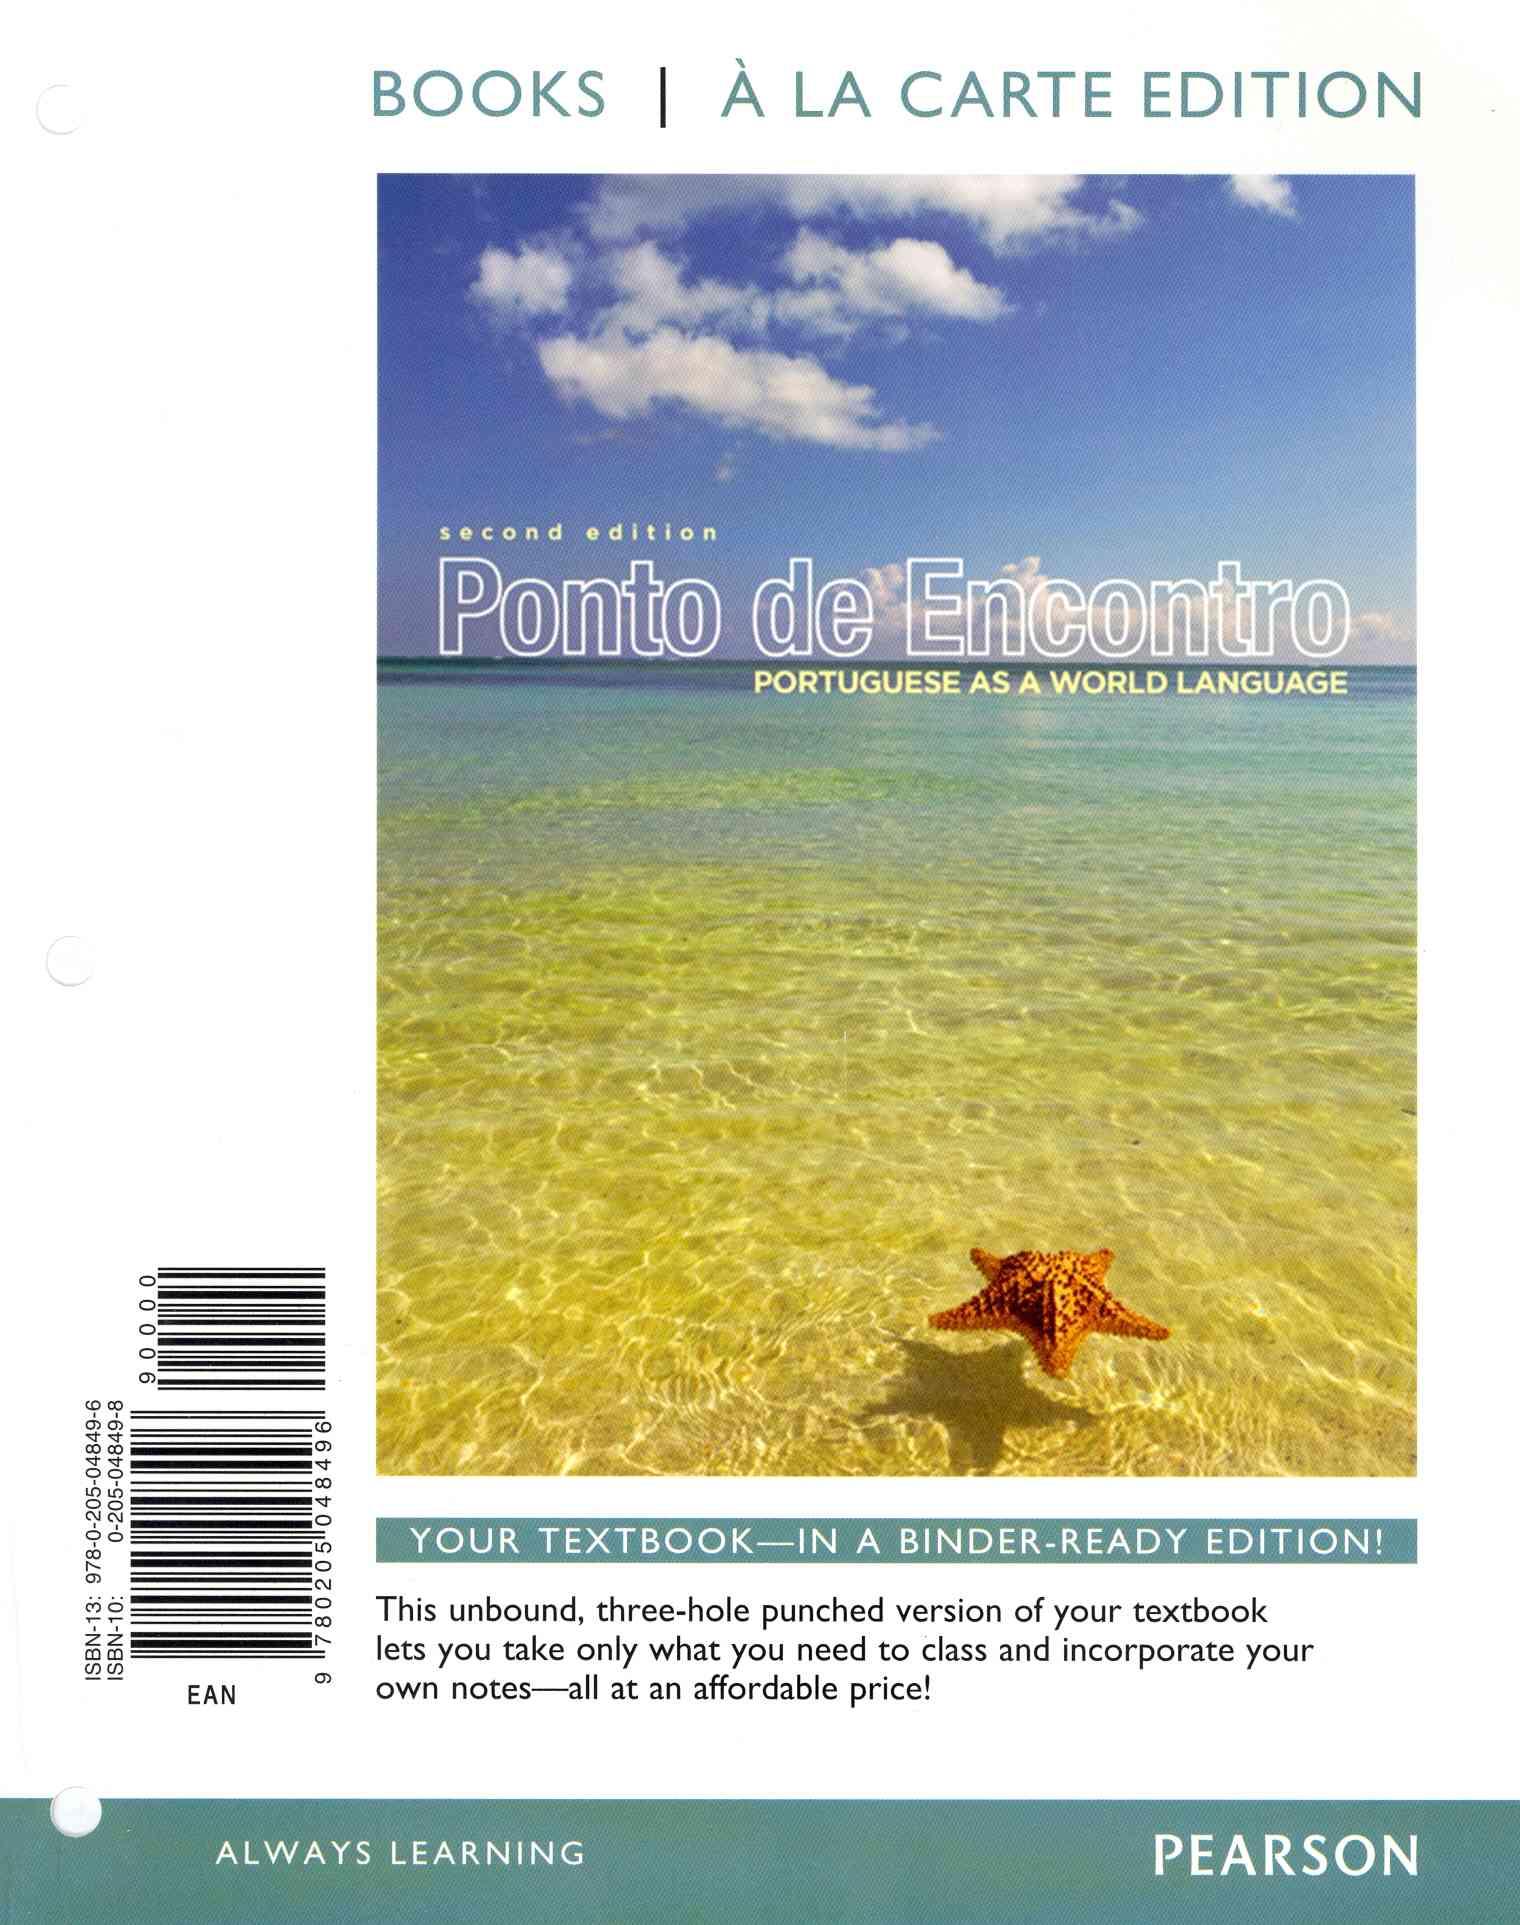 Ponto De Encontro By De Jouet-pastre, Clemence/ Klobucka, Anna/ Sobral, Patricia Isabel/ Moreira, Maria Luci De Biaji/ Hutchinson, Amelia P.